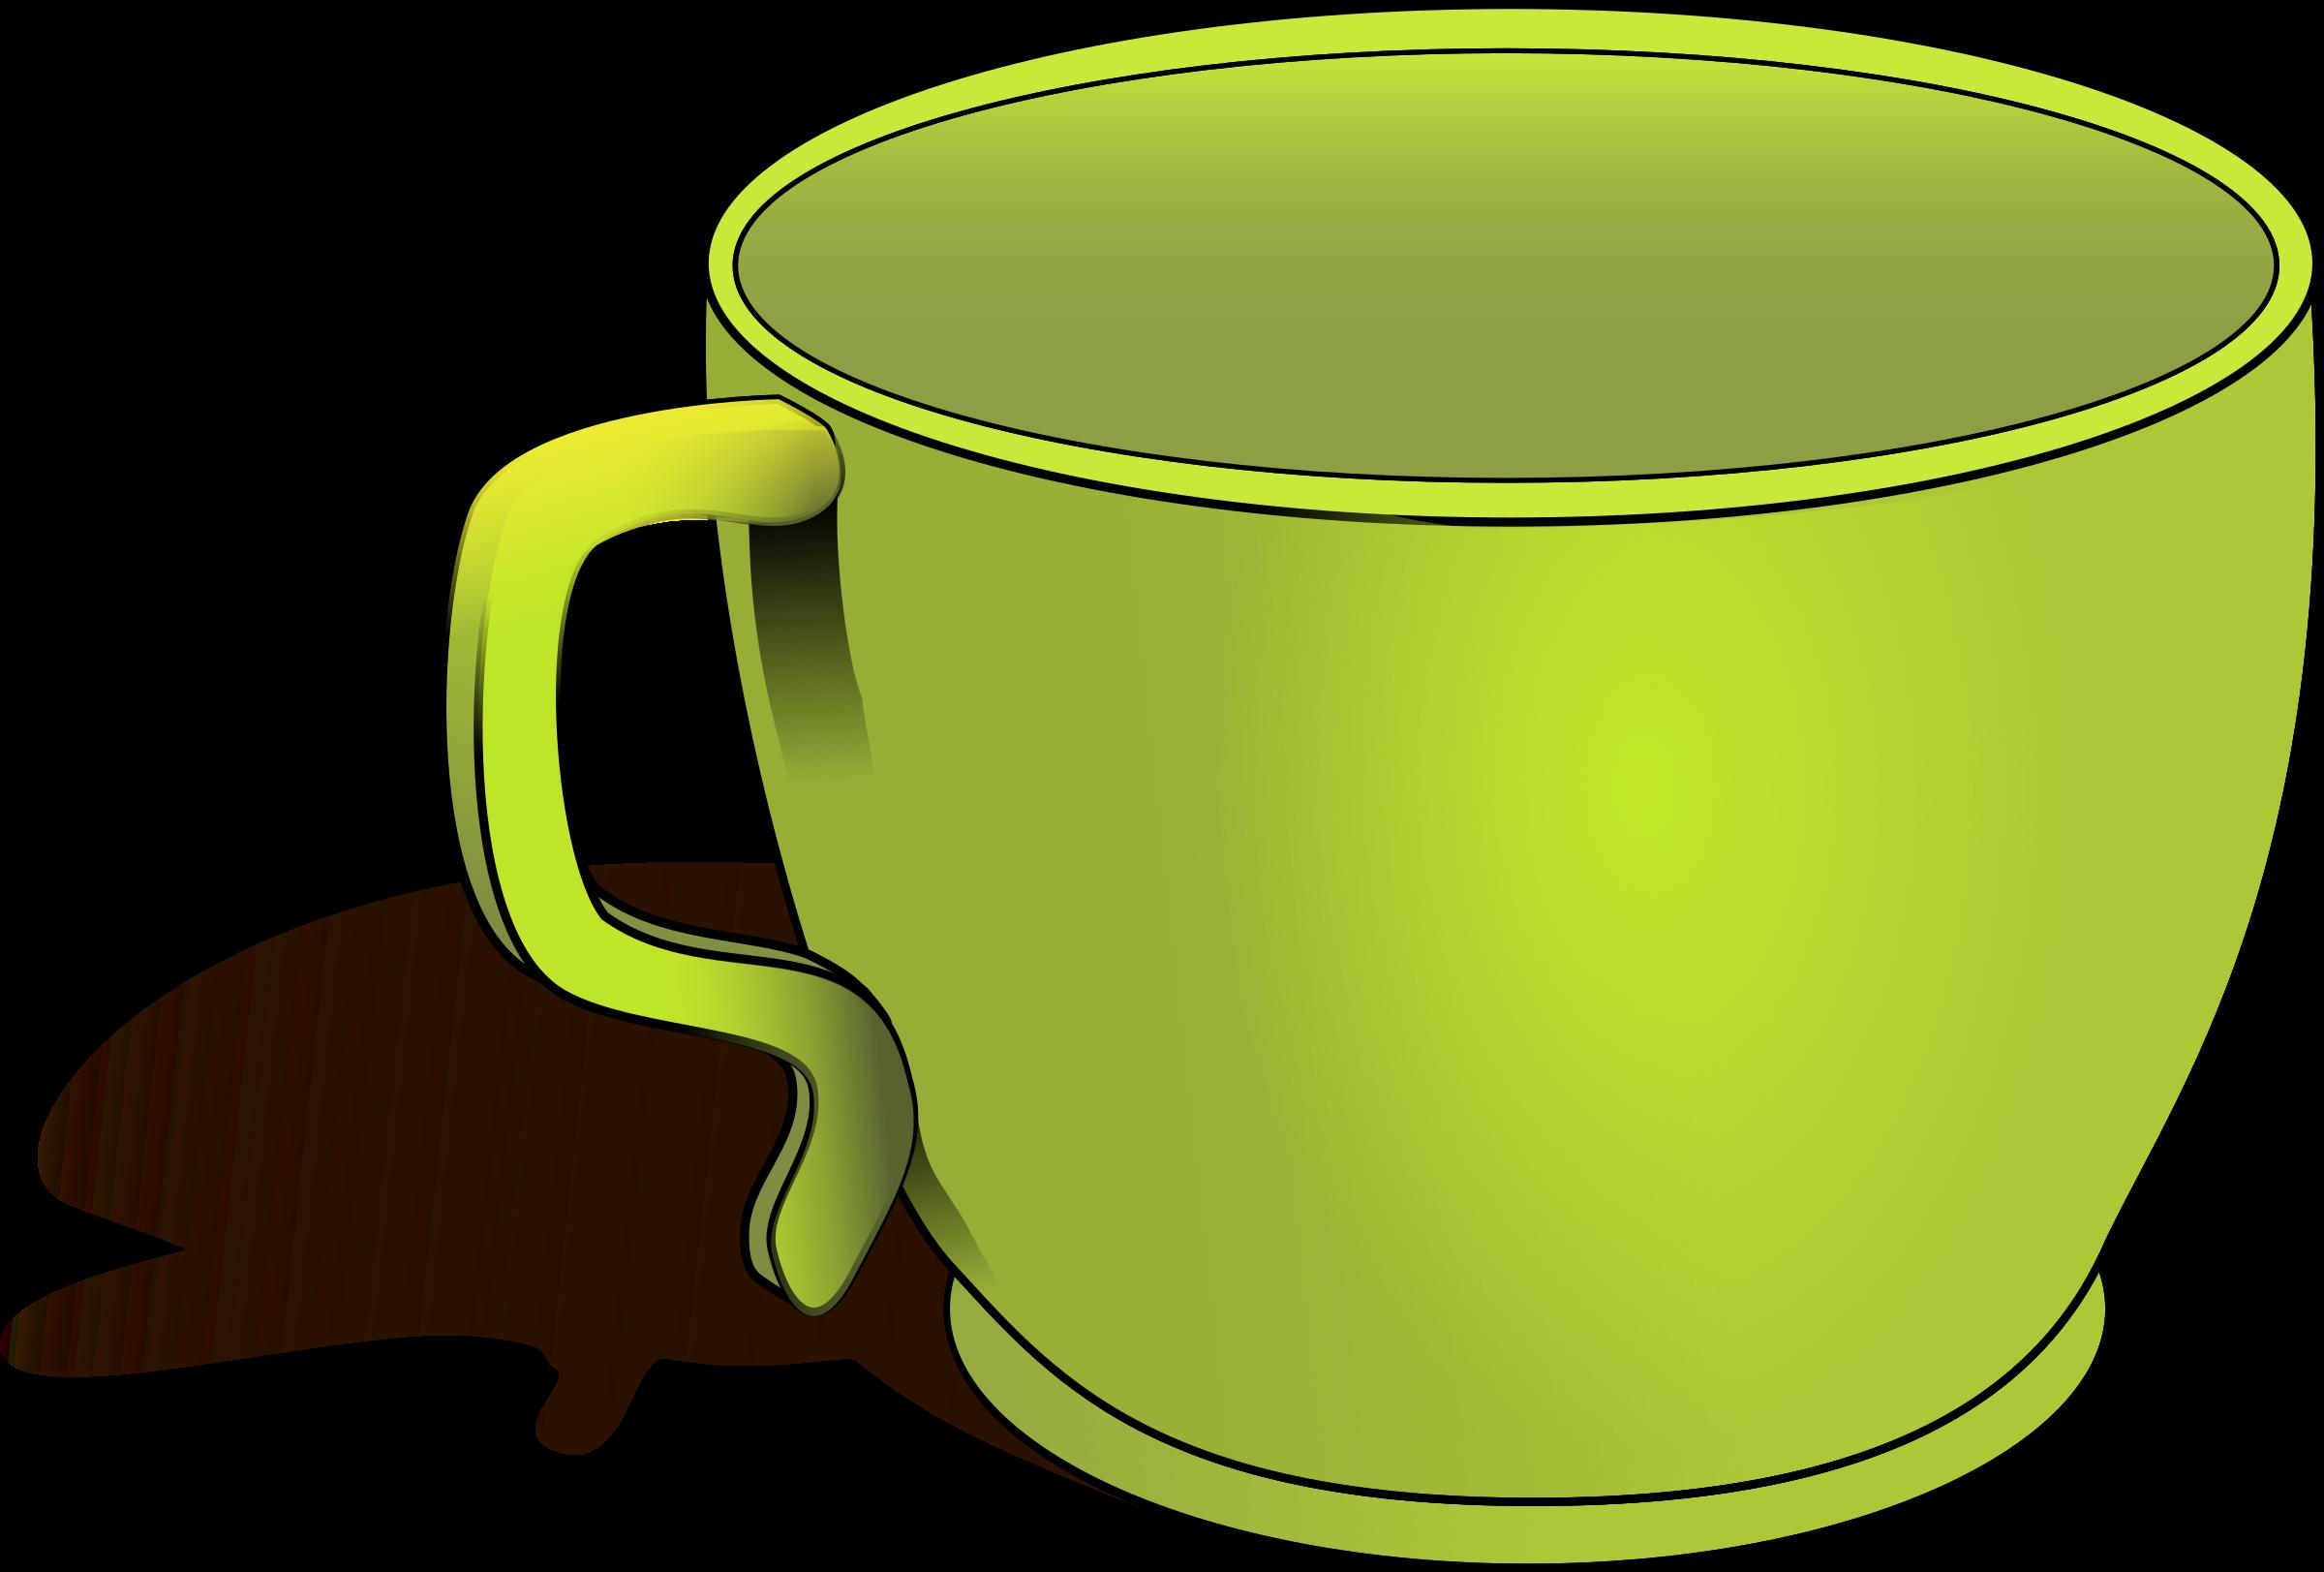 Cup clipart 3 cup. Cartoon cups blueridge wallpapers